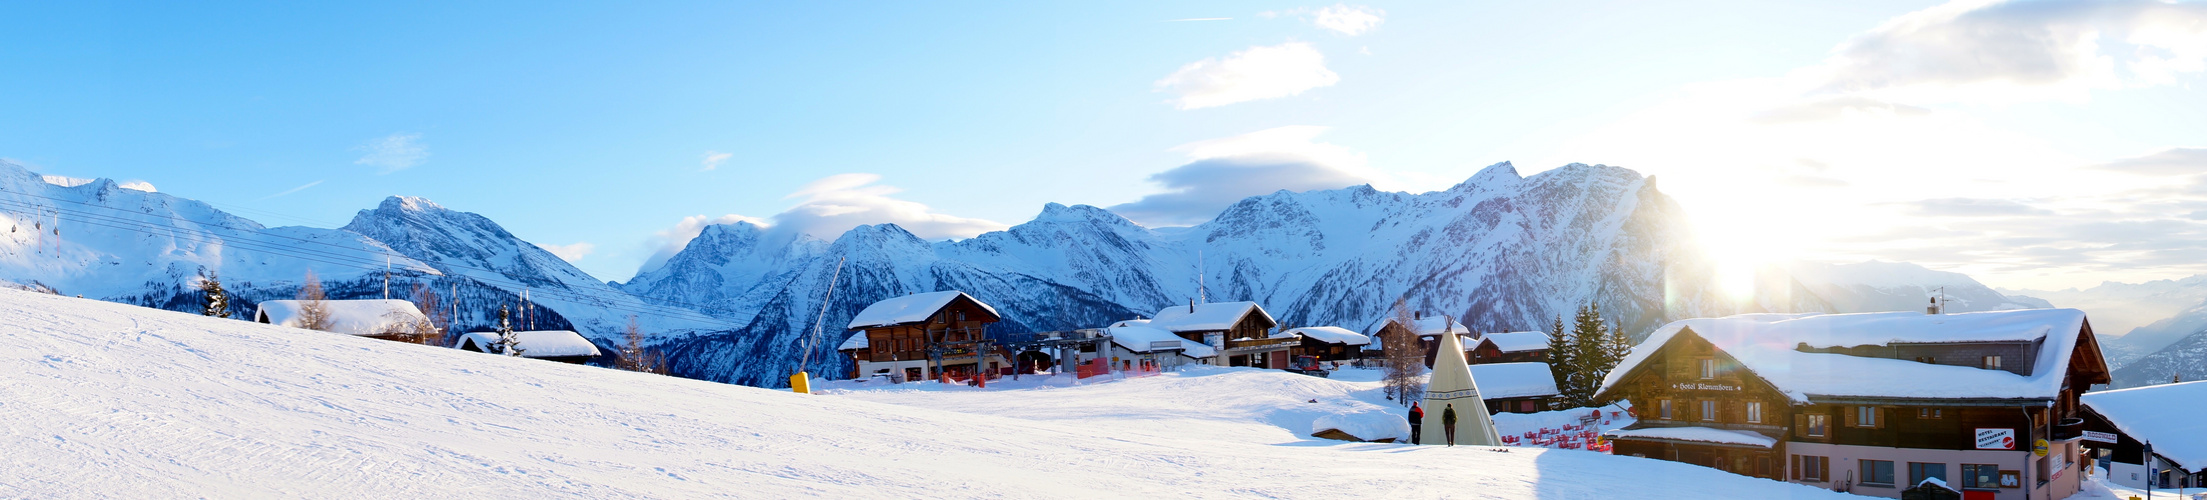 Alpenpanorama Rosswald (2)